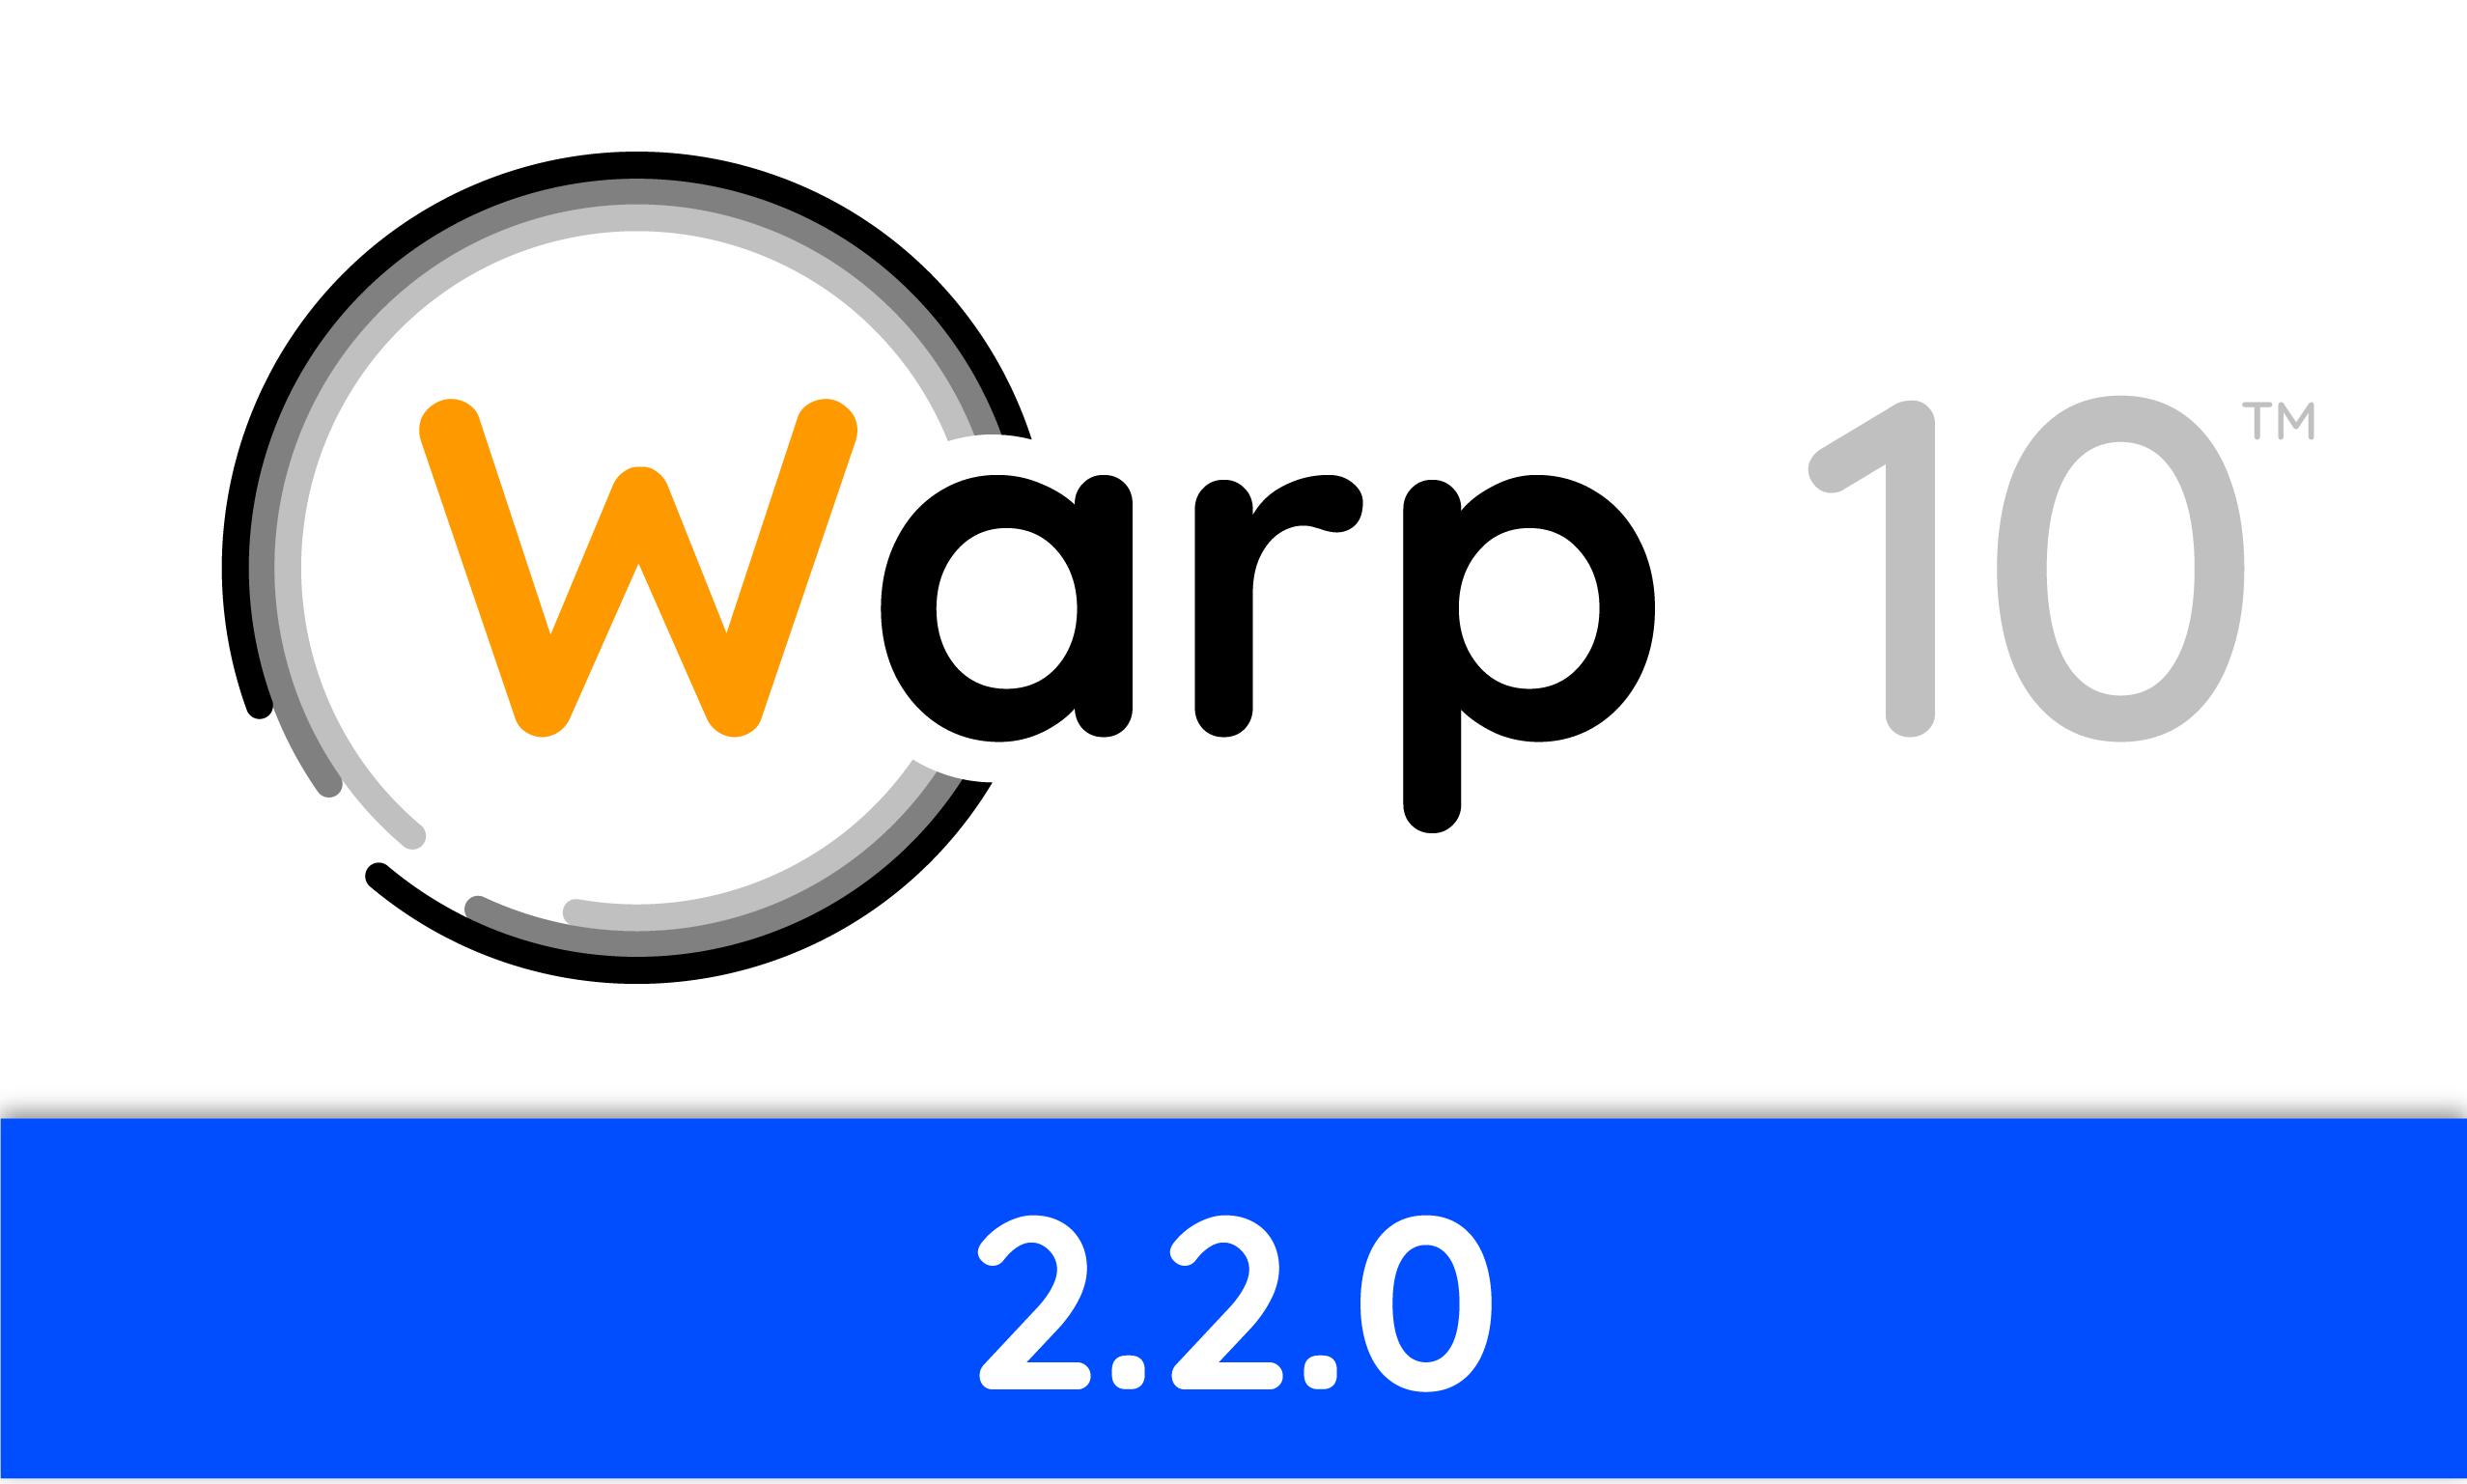 Warp 10 release 2.2.0